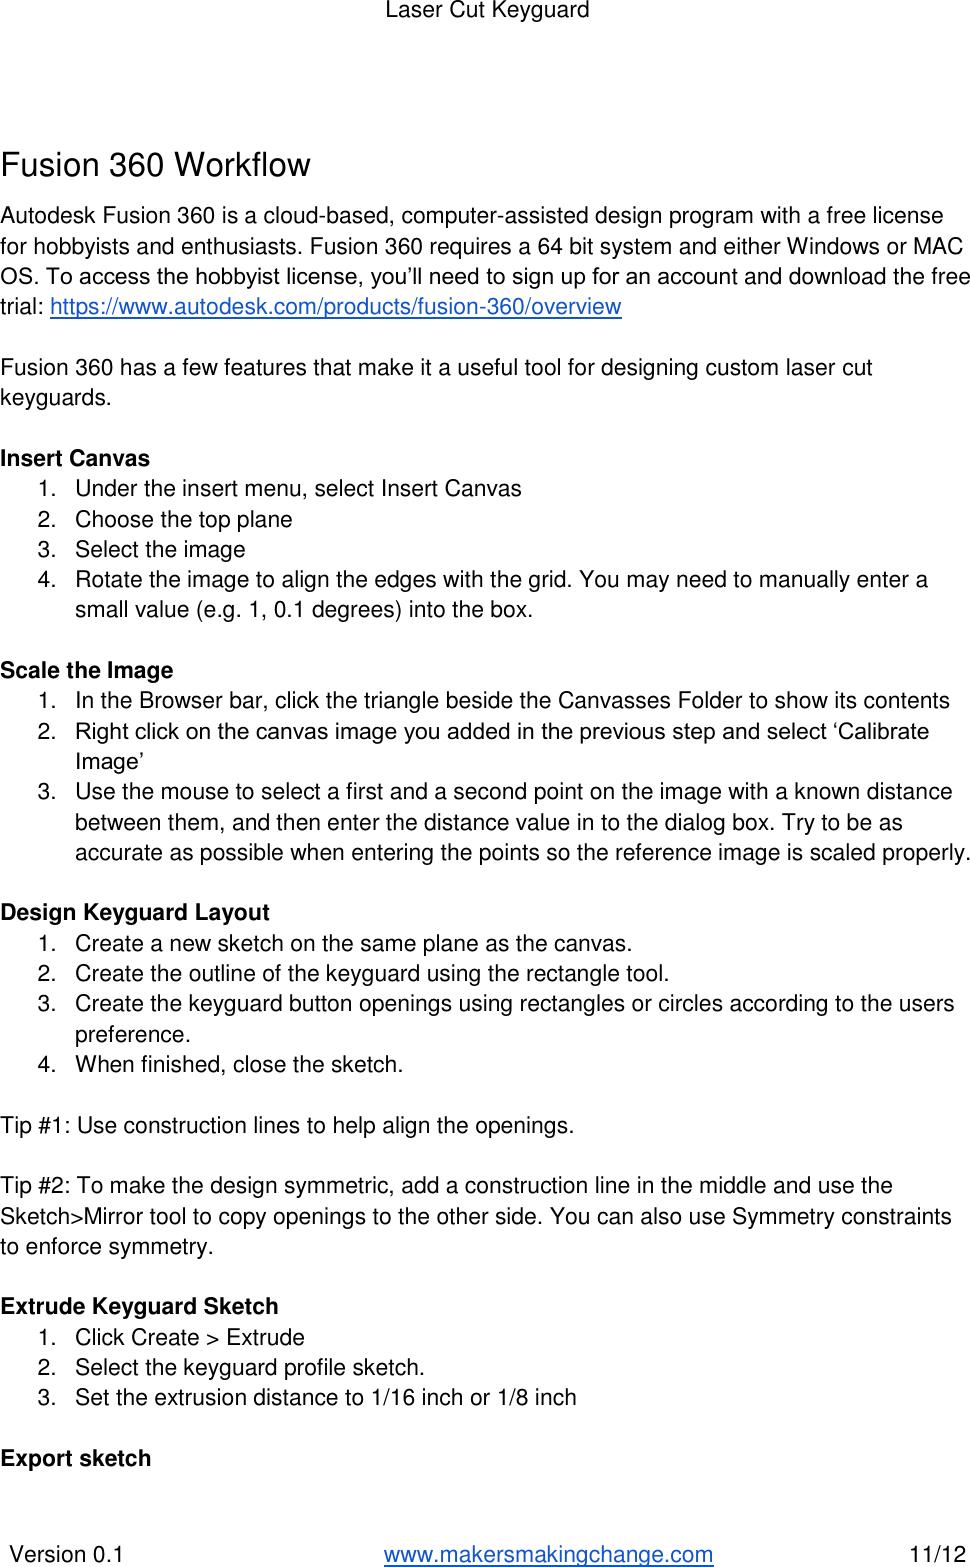 Lasercut Keyguard Instructions V0 1